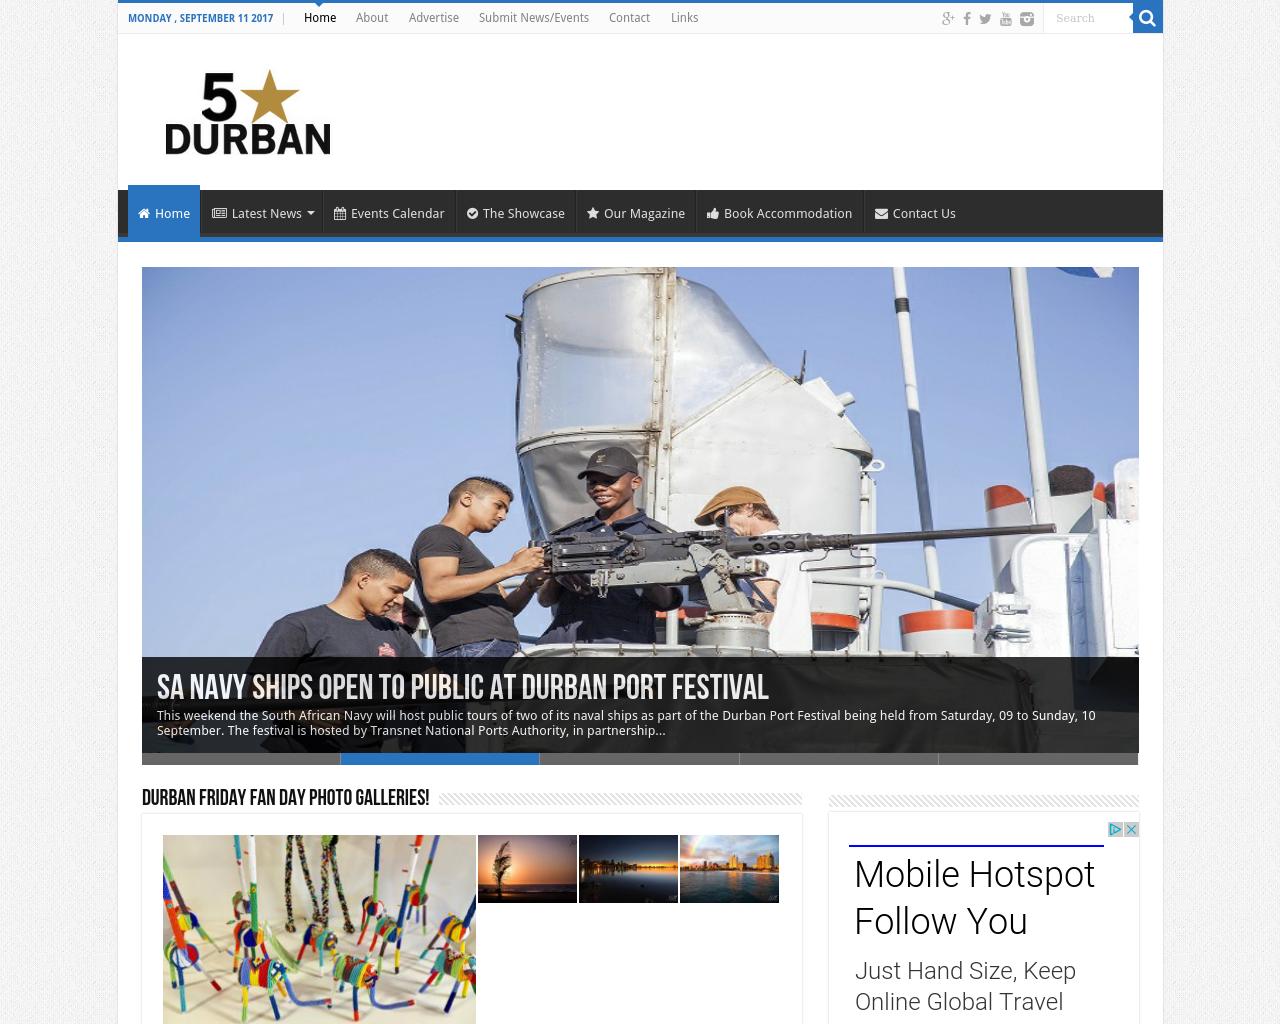 5-Star-Durban-Advertising-Reviews-Pricing